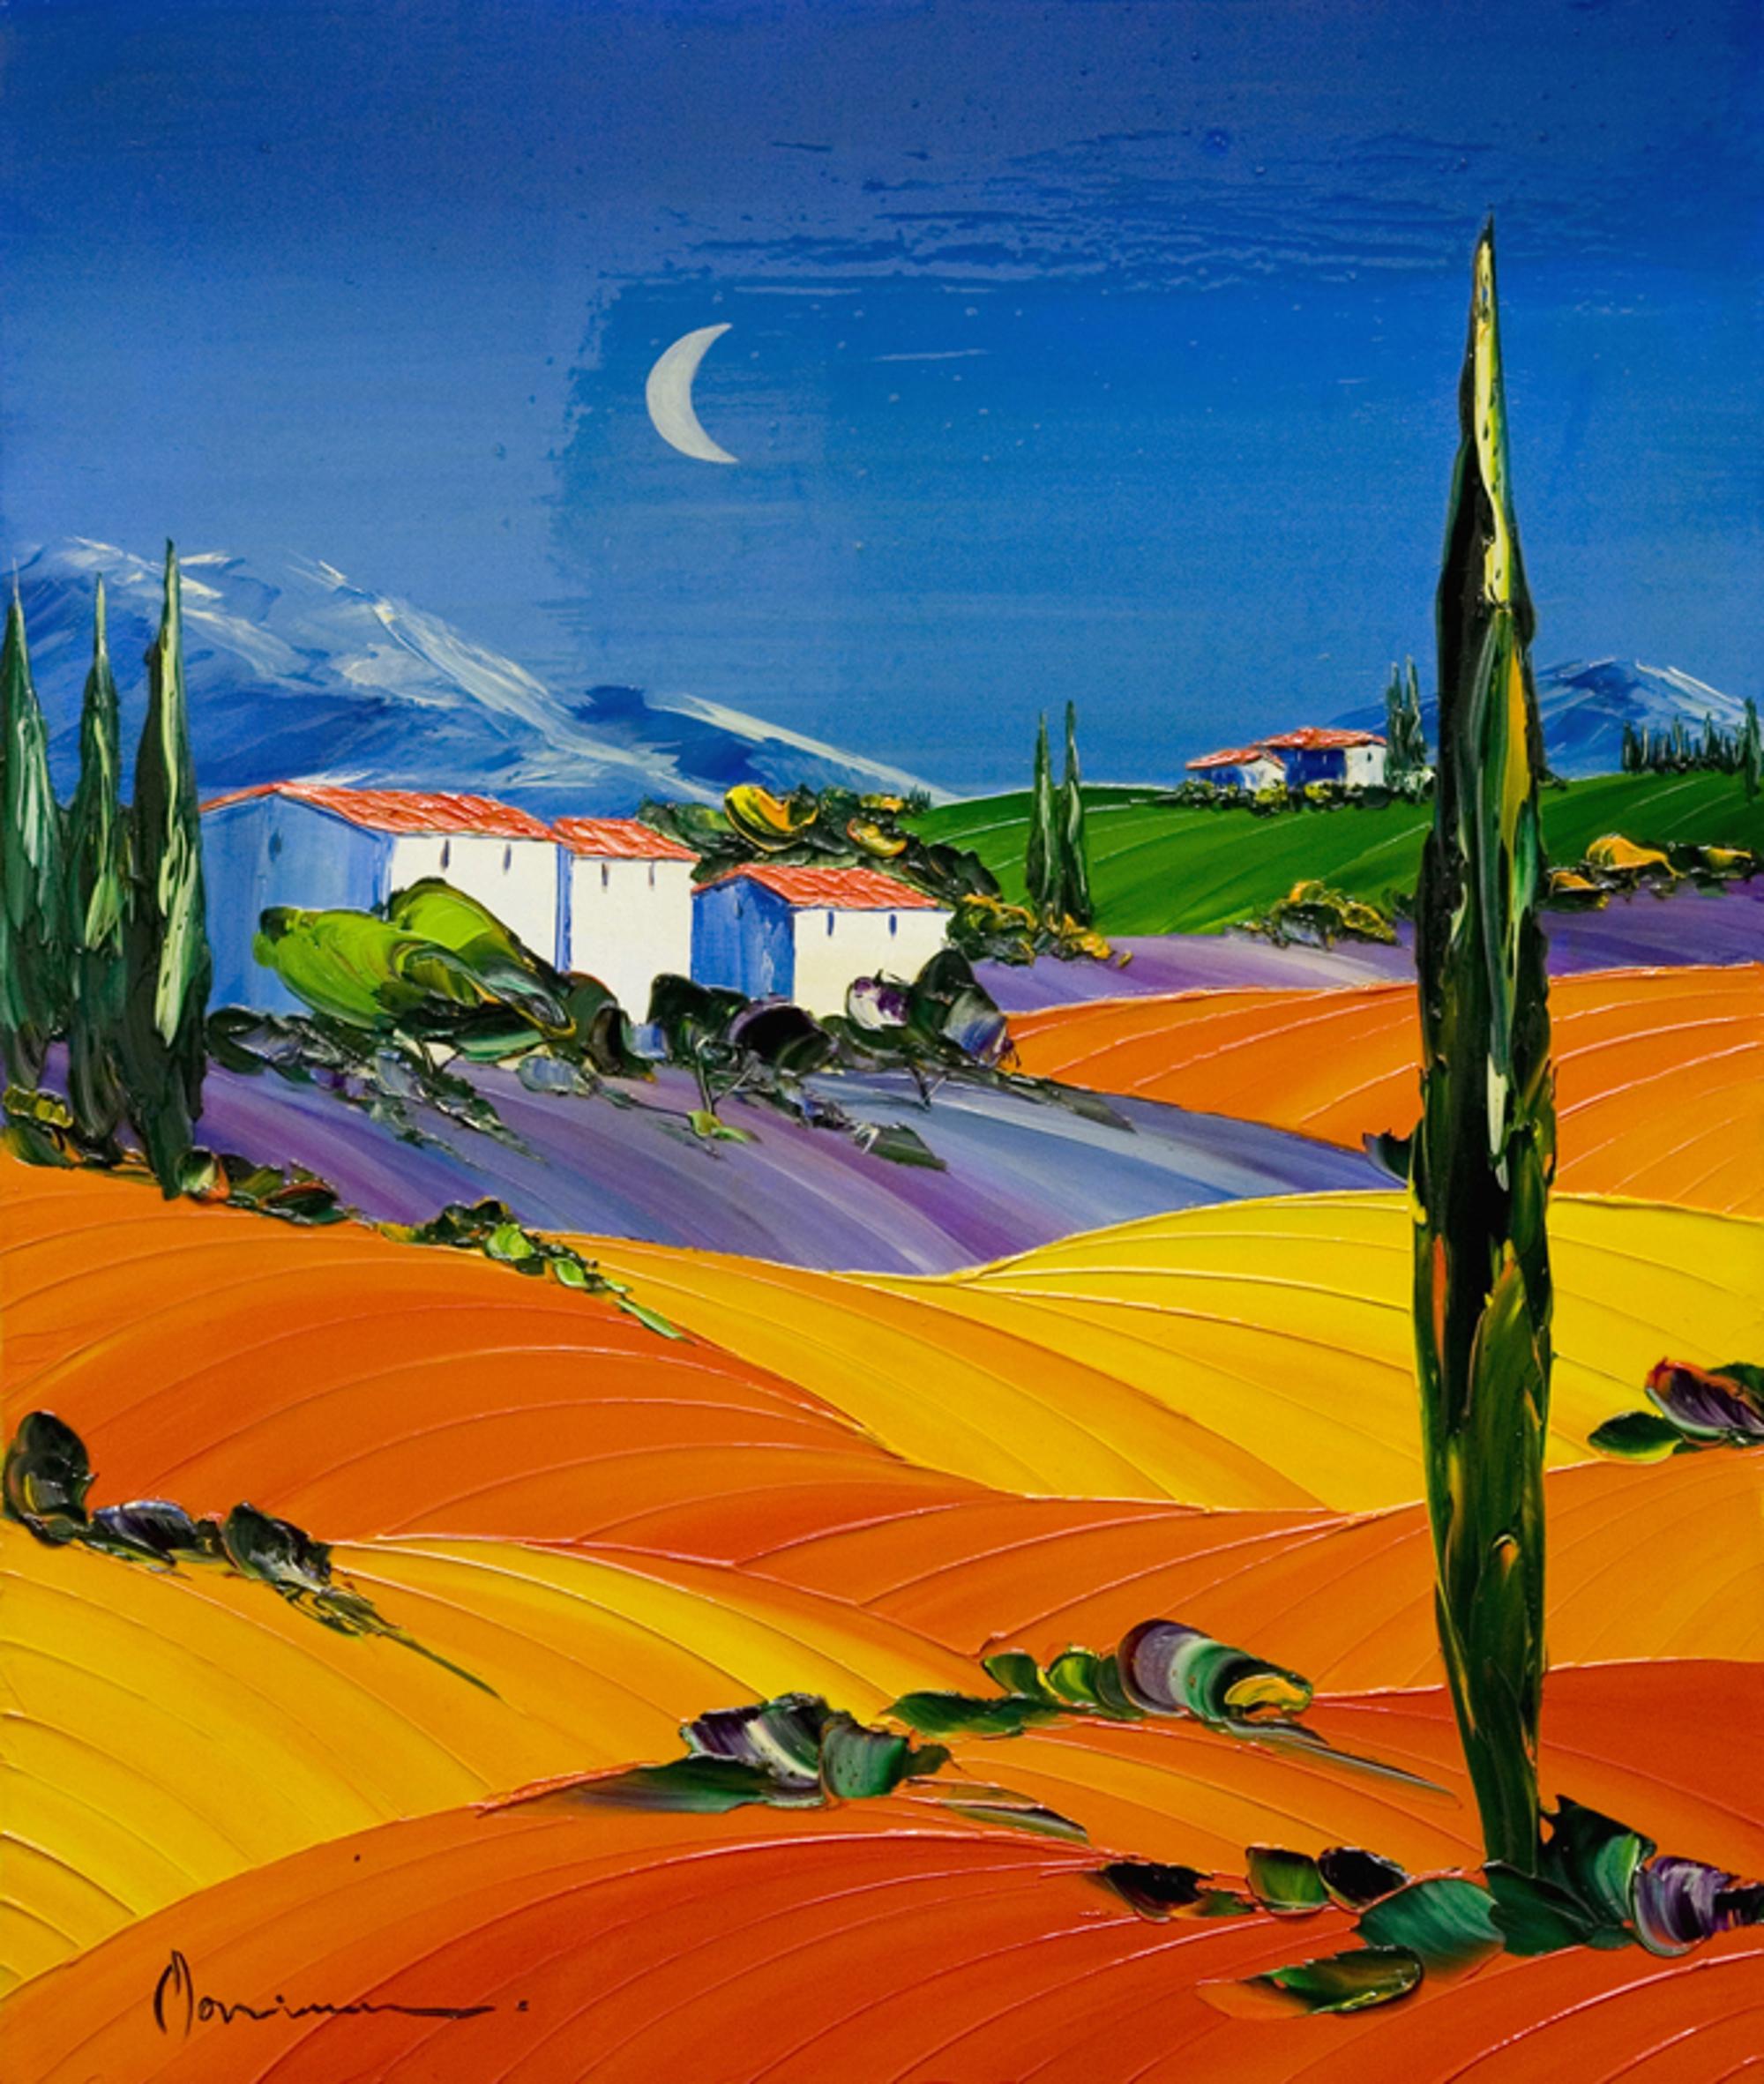 Le Cypres by Monika Munier